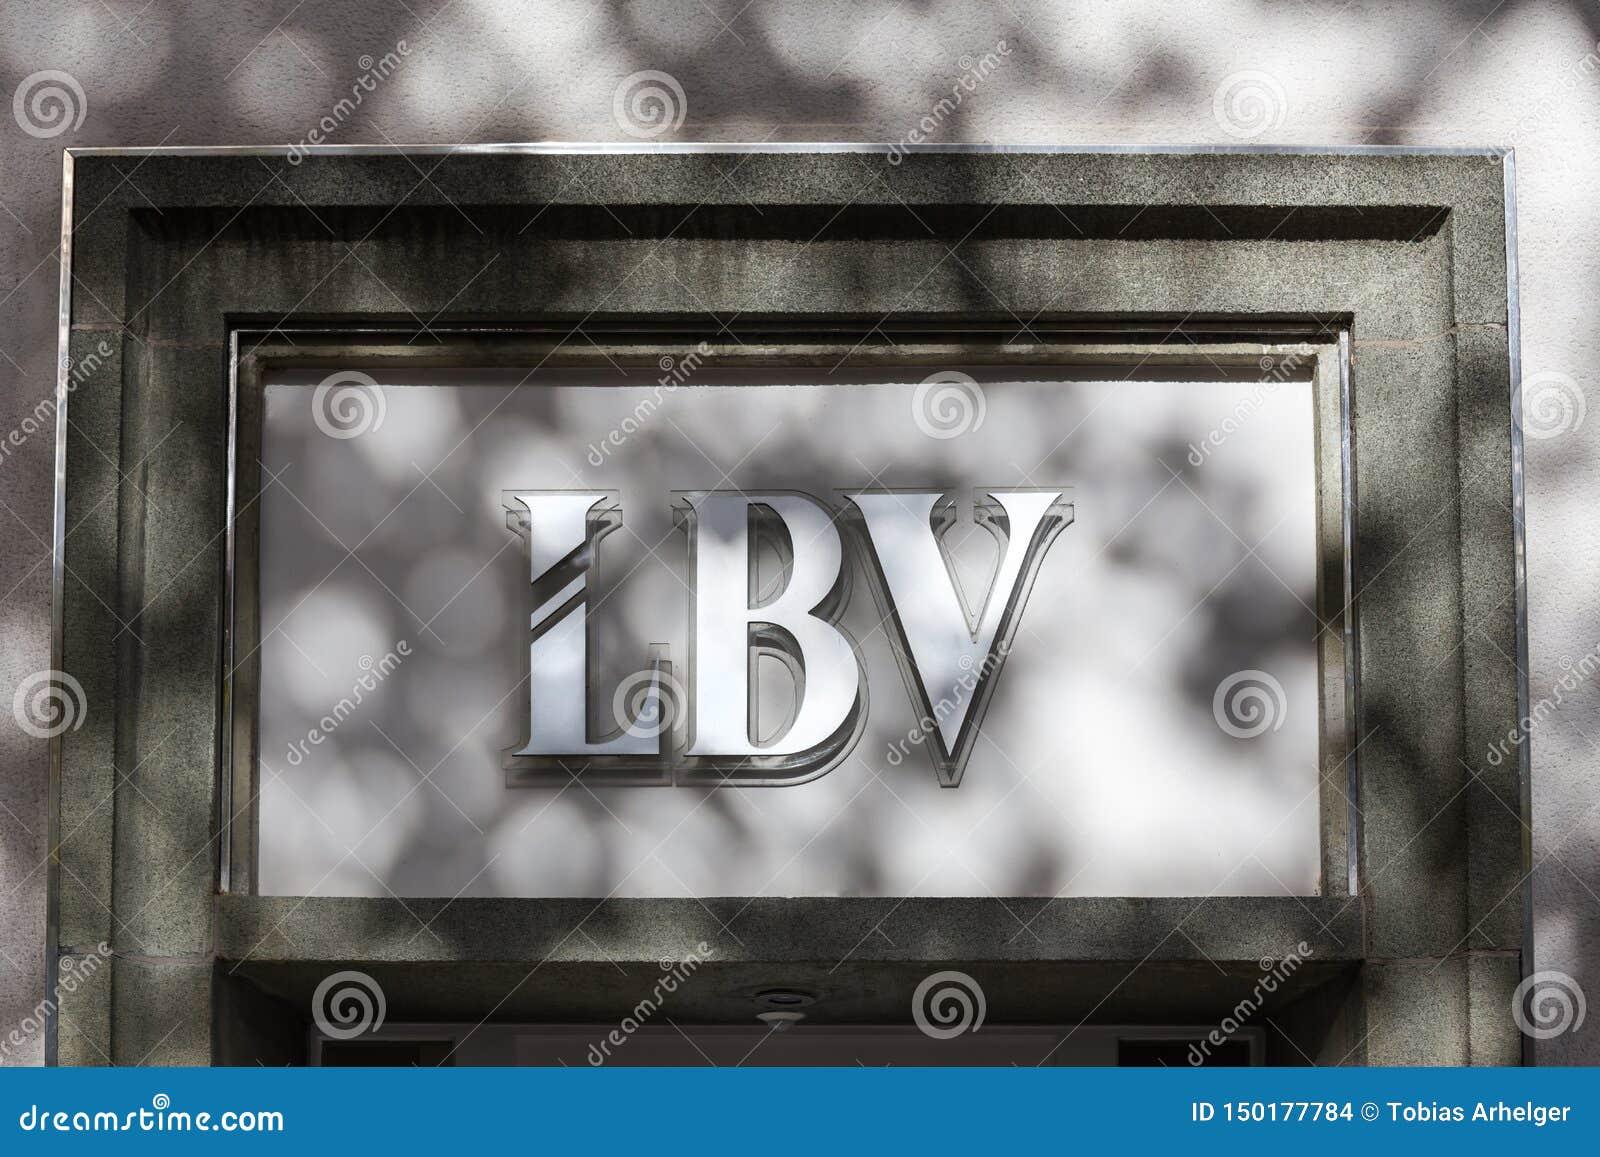 Lbv sign in dortmund germany